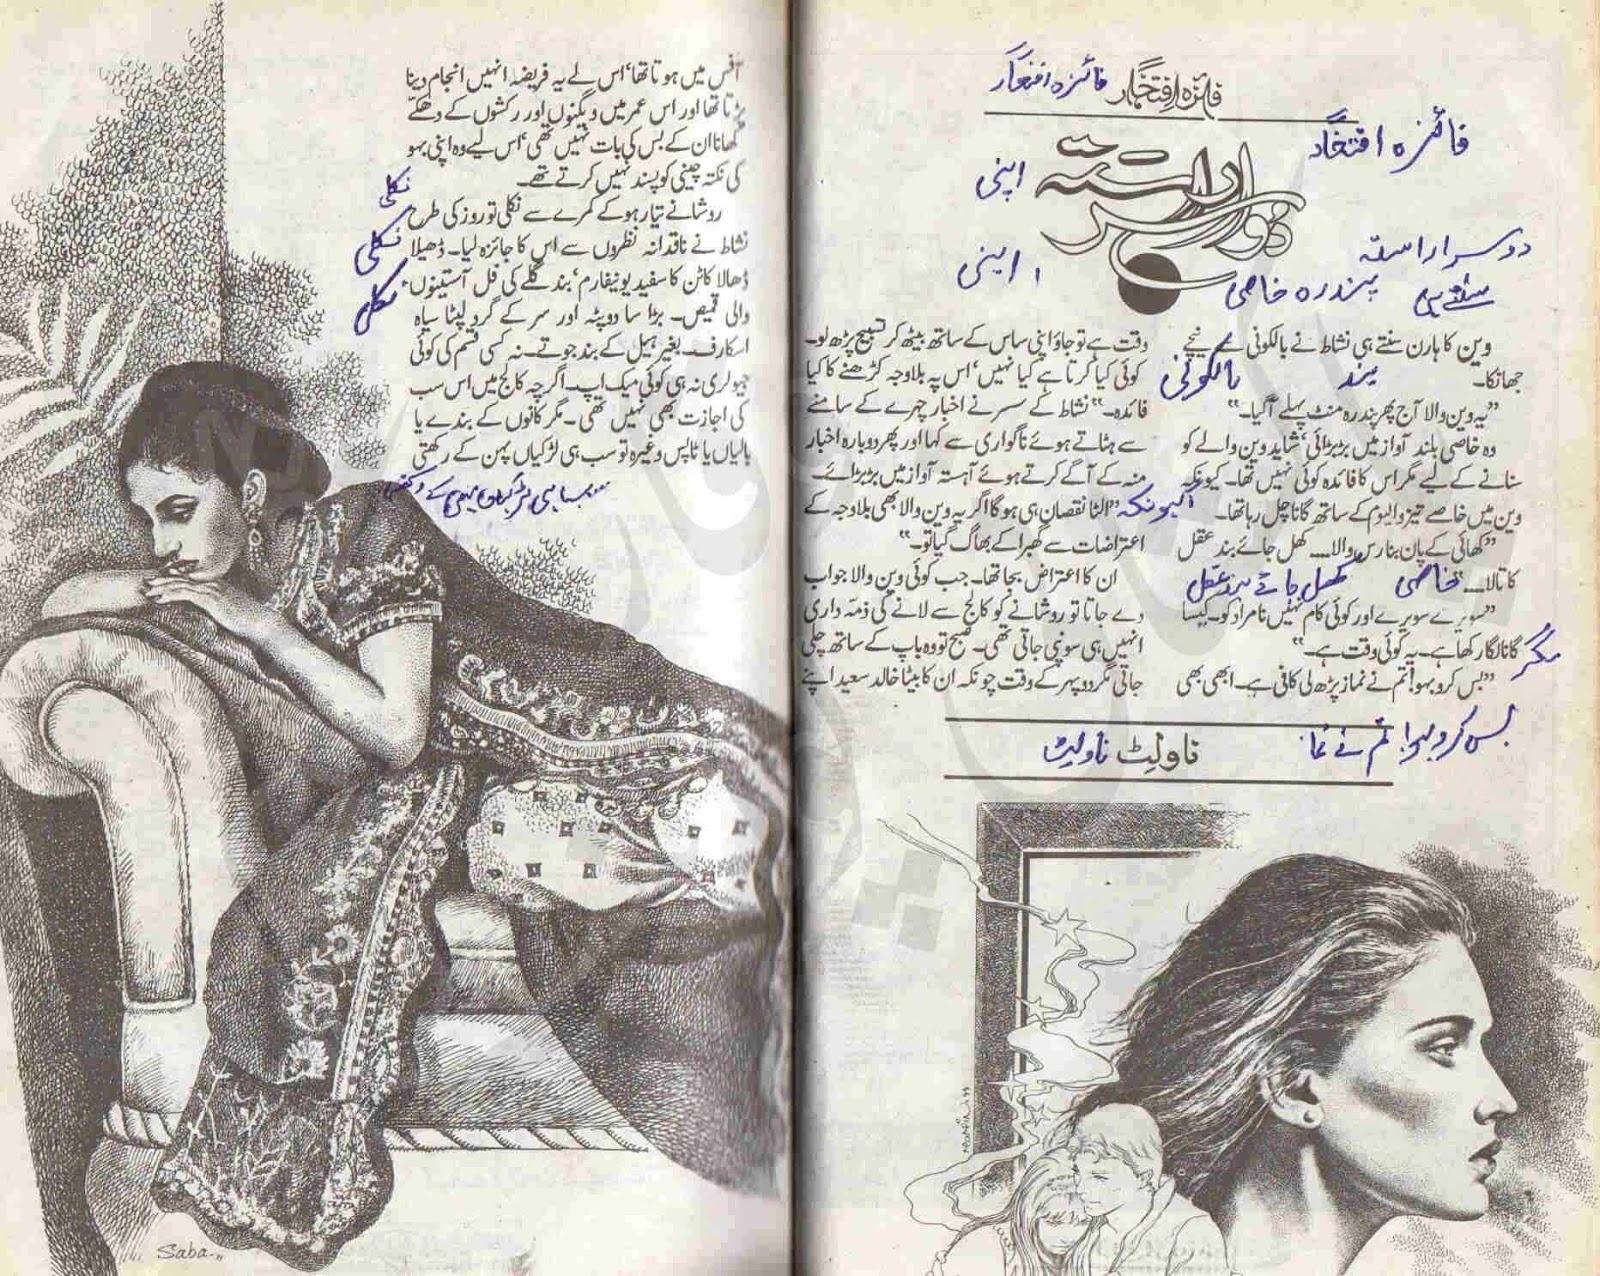 A p27 1 - Dosra Rasta by Faiza Iftikhar